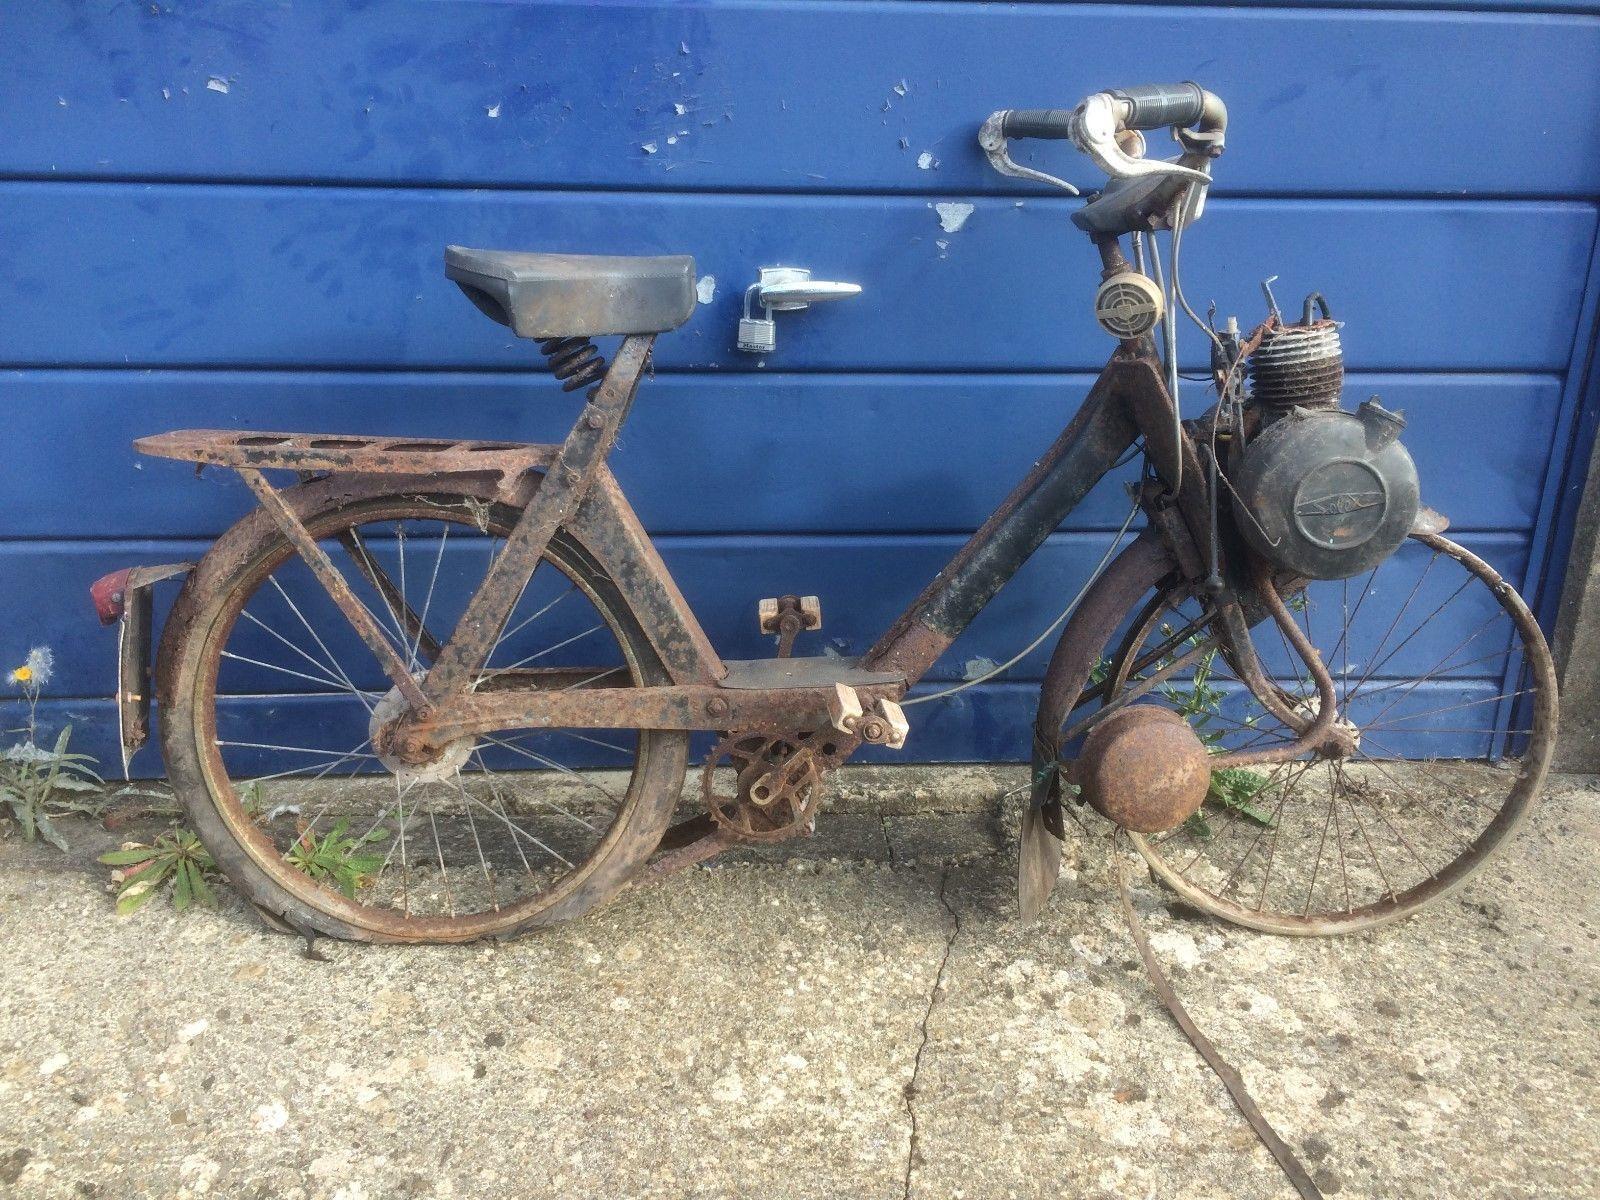 velosolex moped barn find  https://t.co/K4hQFvHuuL https://t.co/S6NU9ZJZrv